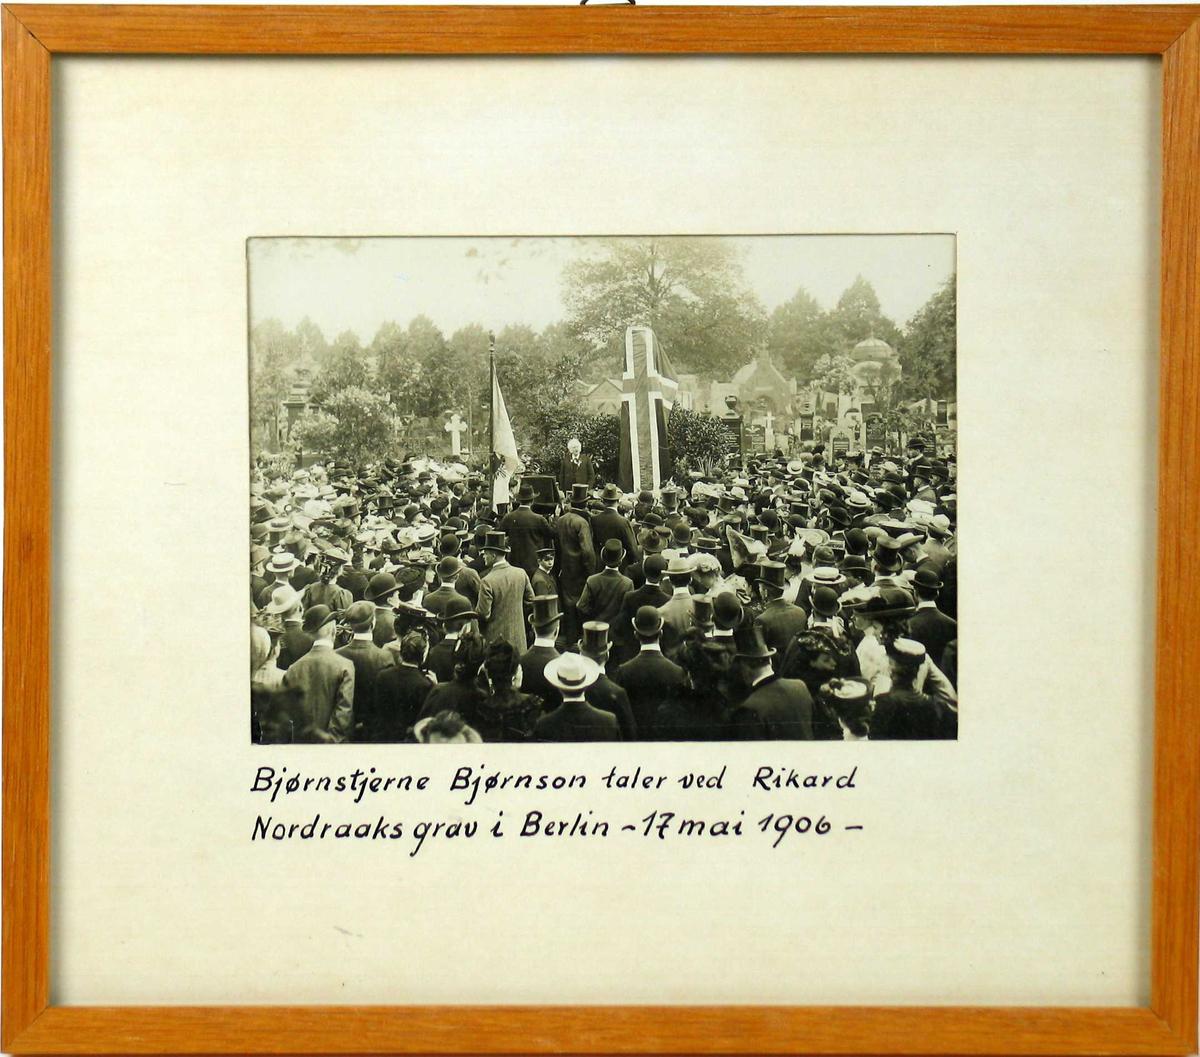 BB på talerstolen, stor folkemengde rundt. Det norske flagget dekker bautaen.